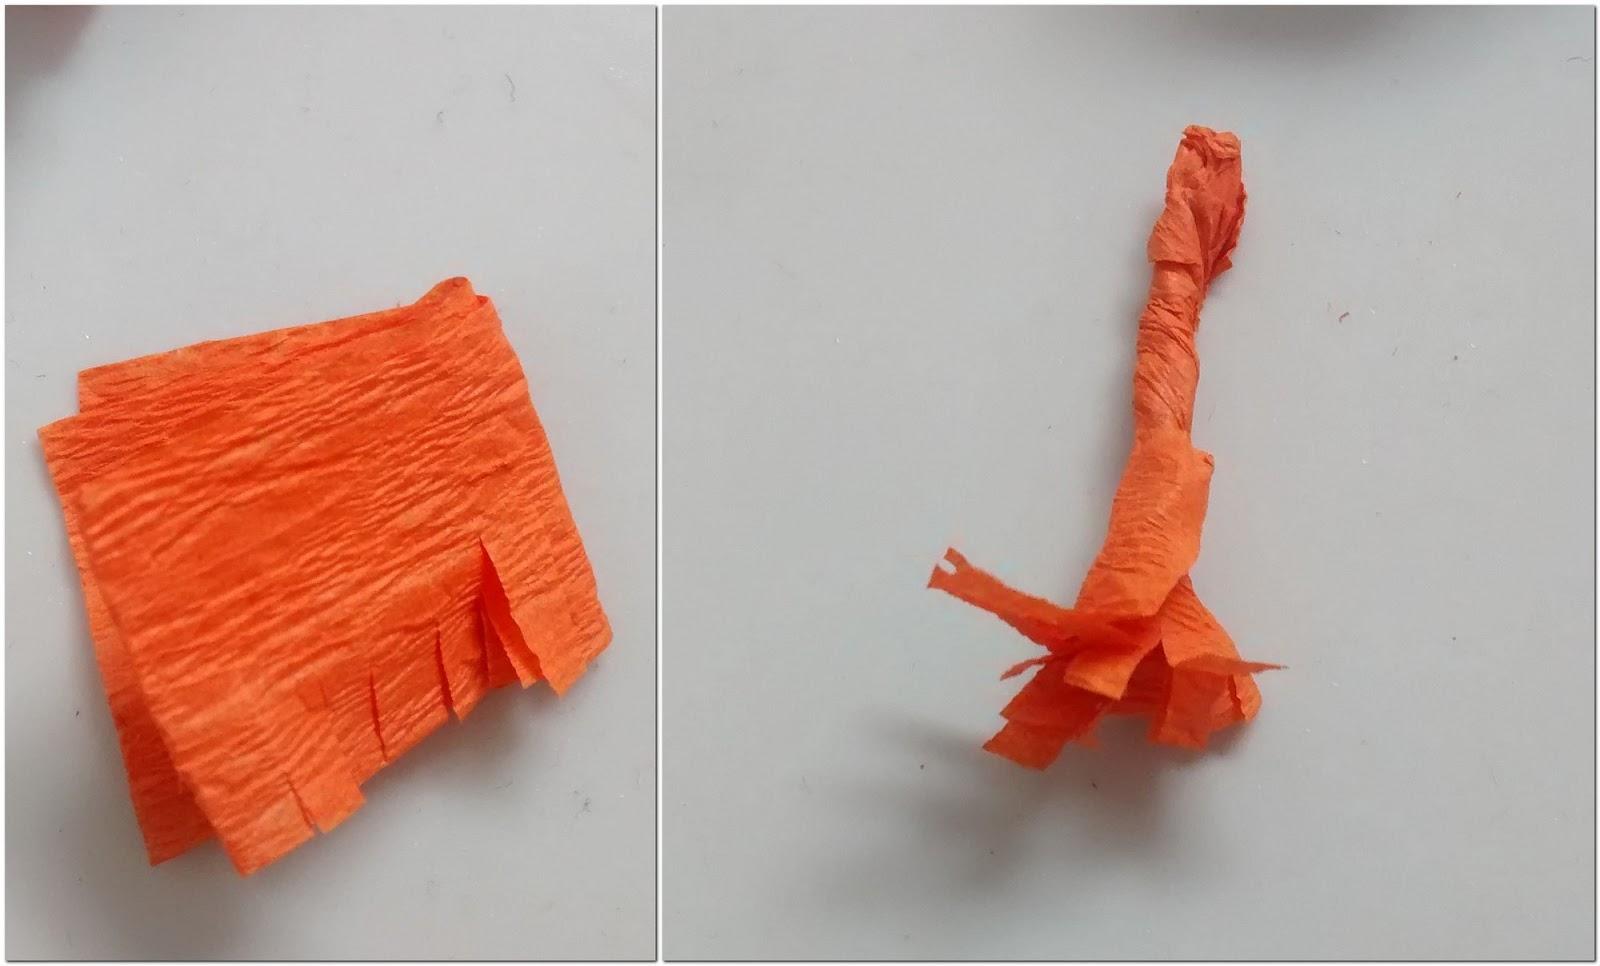 The sunshine corner diwali decor crepe paper marigolds for Decor using crepe paper